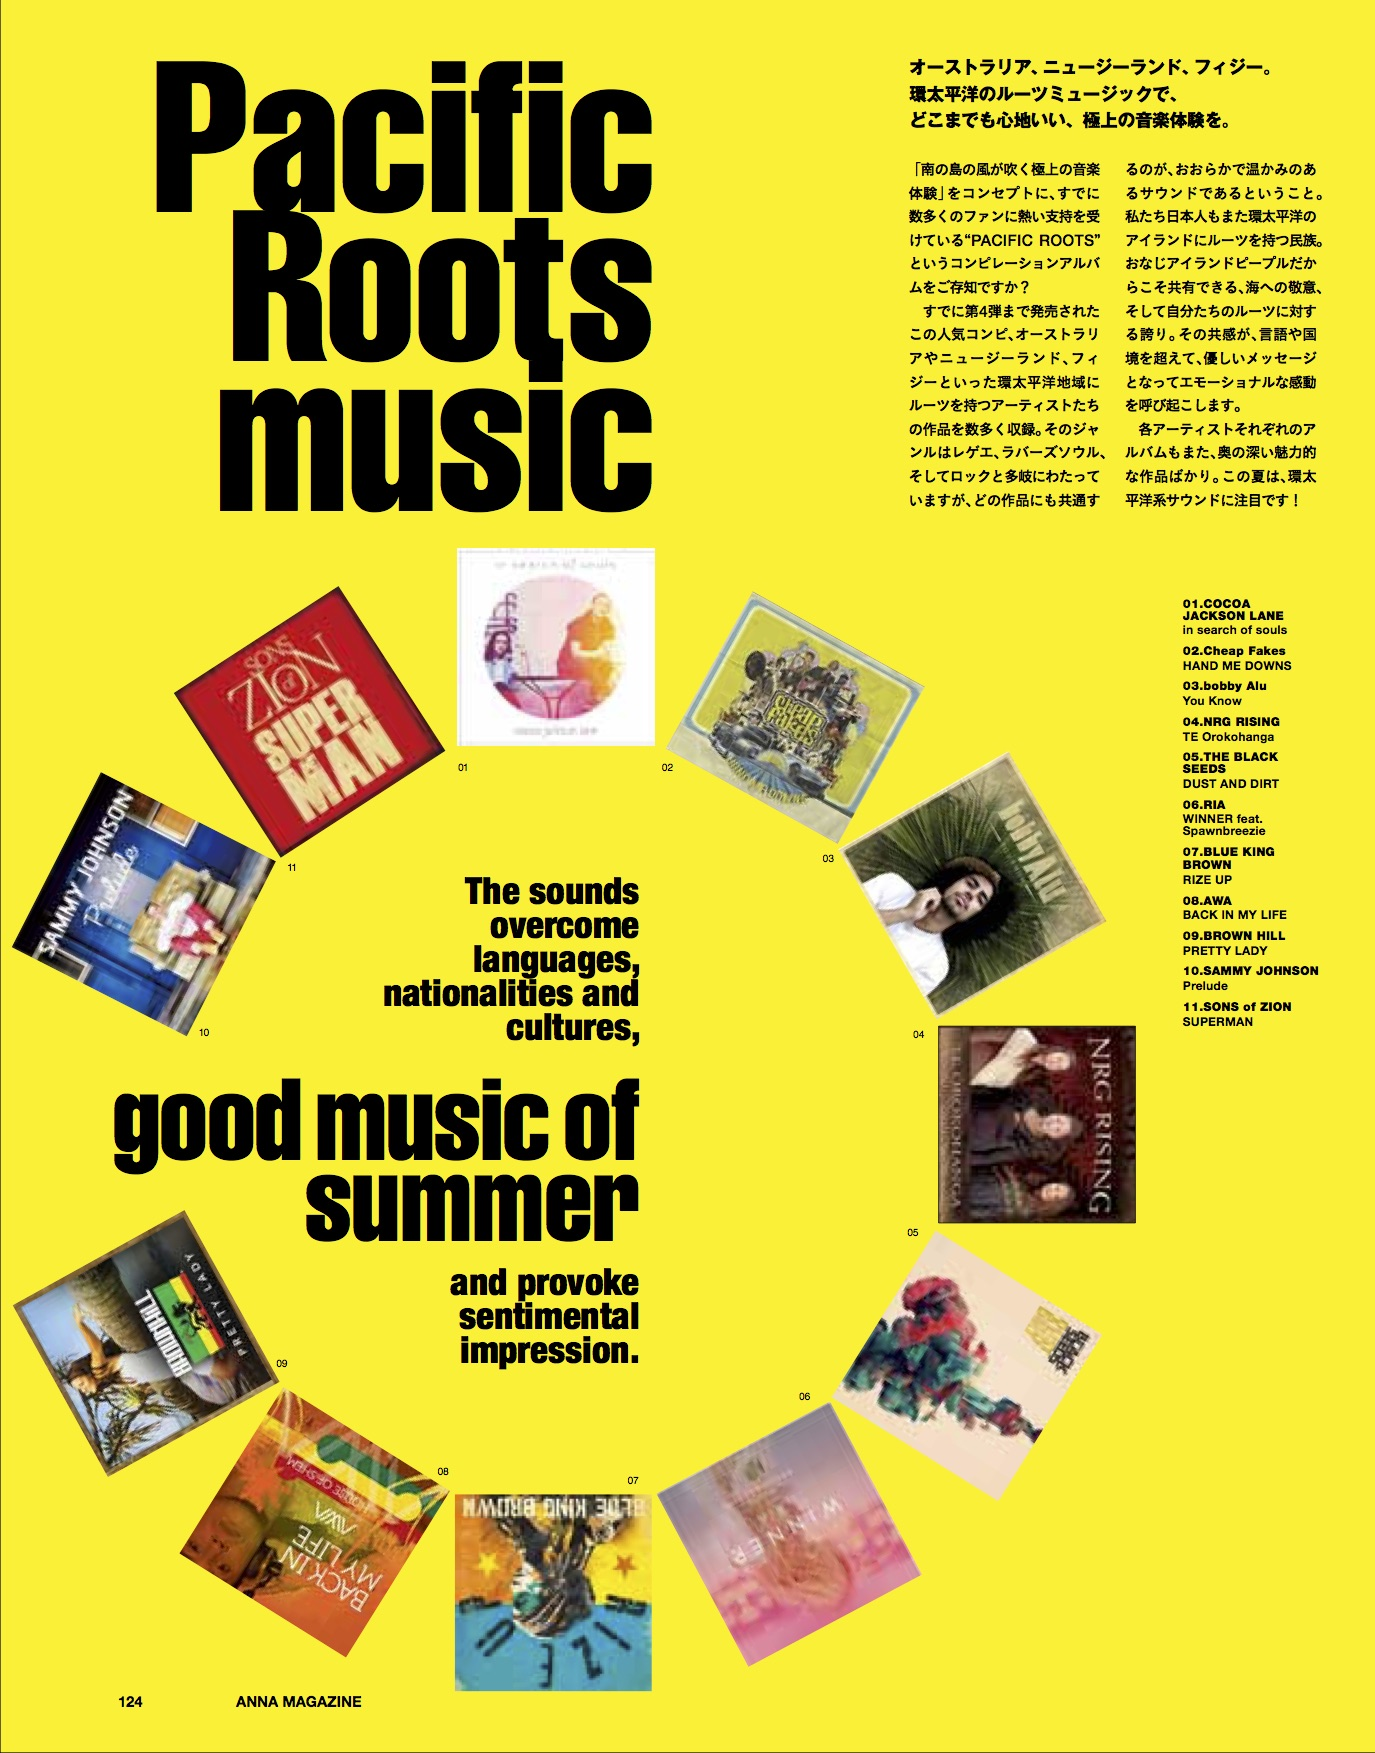 anna magazine Vol.3 P38